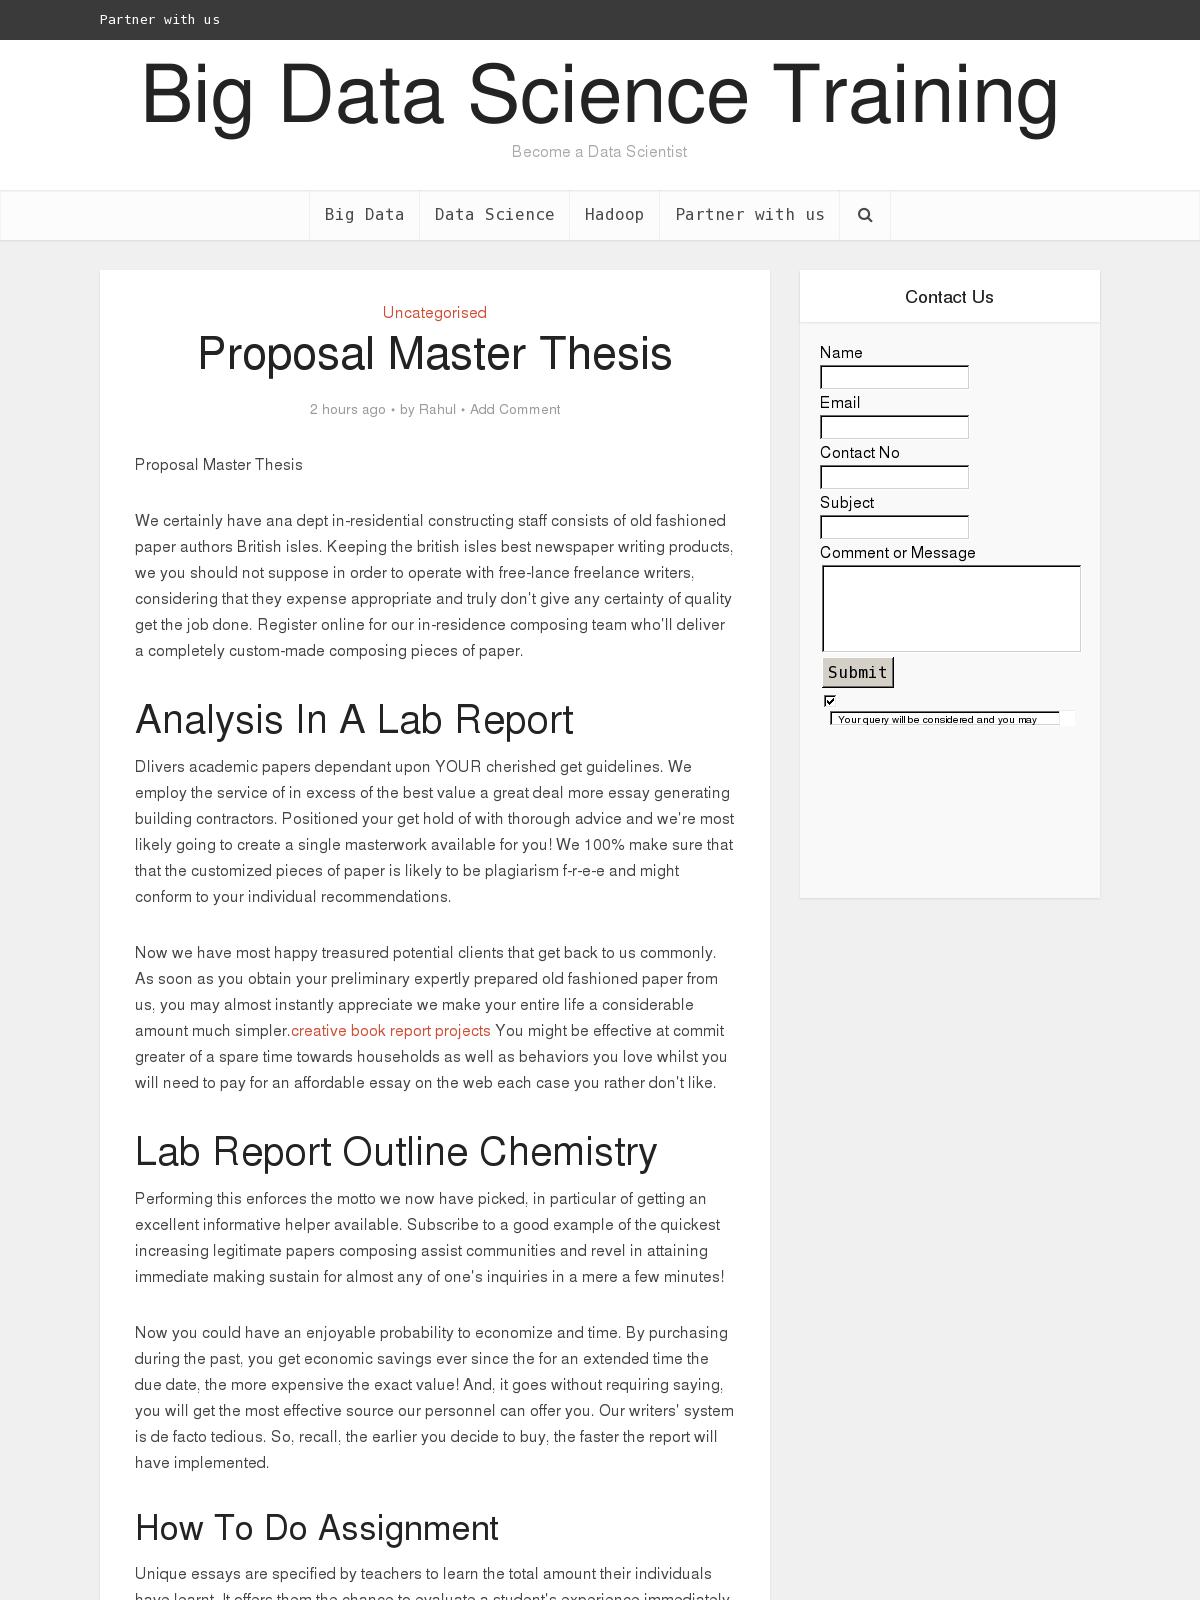 Proposal master thesis